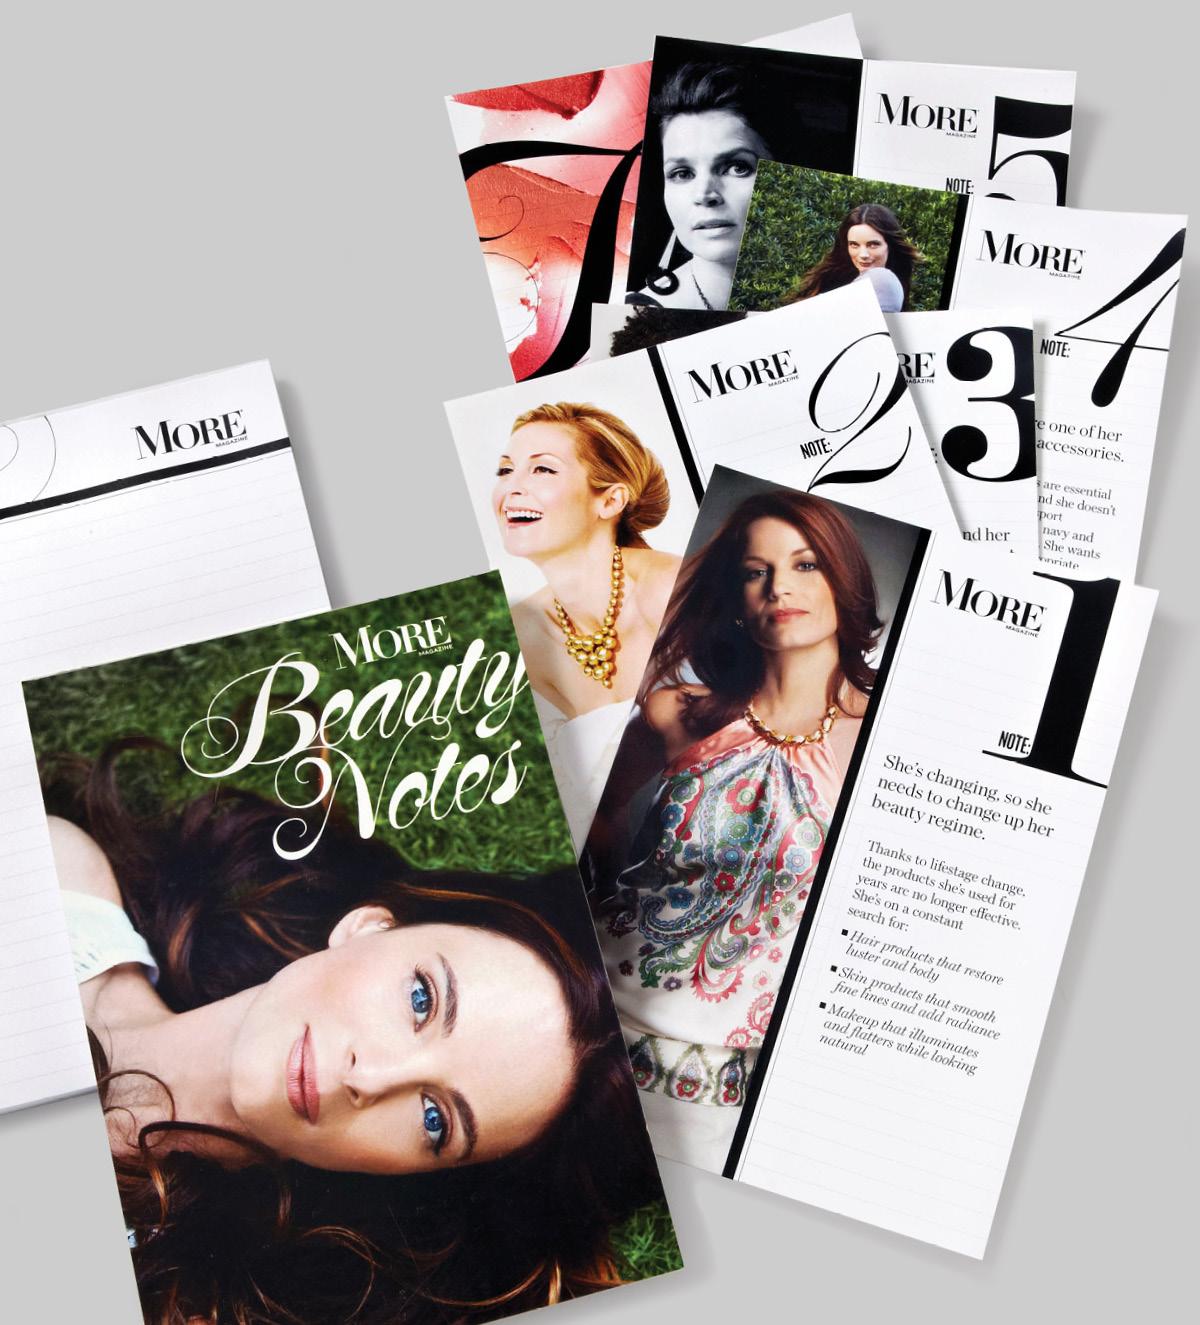 ARTWORK: MORE Magazine Beauty Notes Notepad